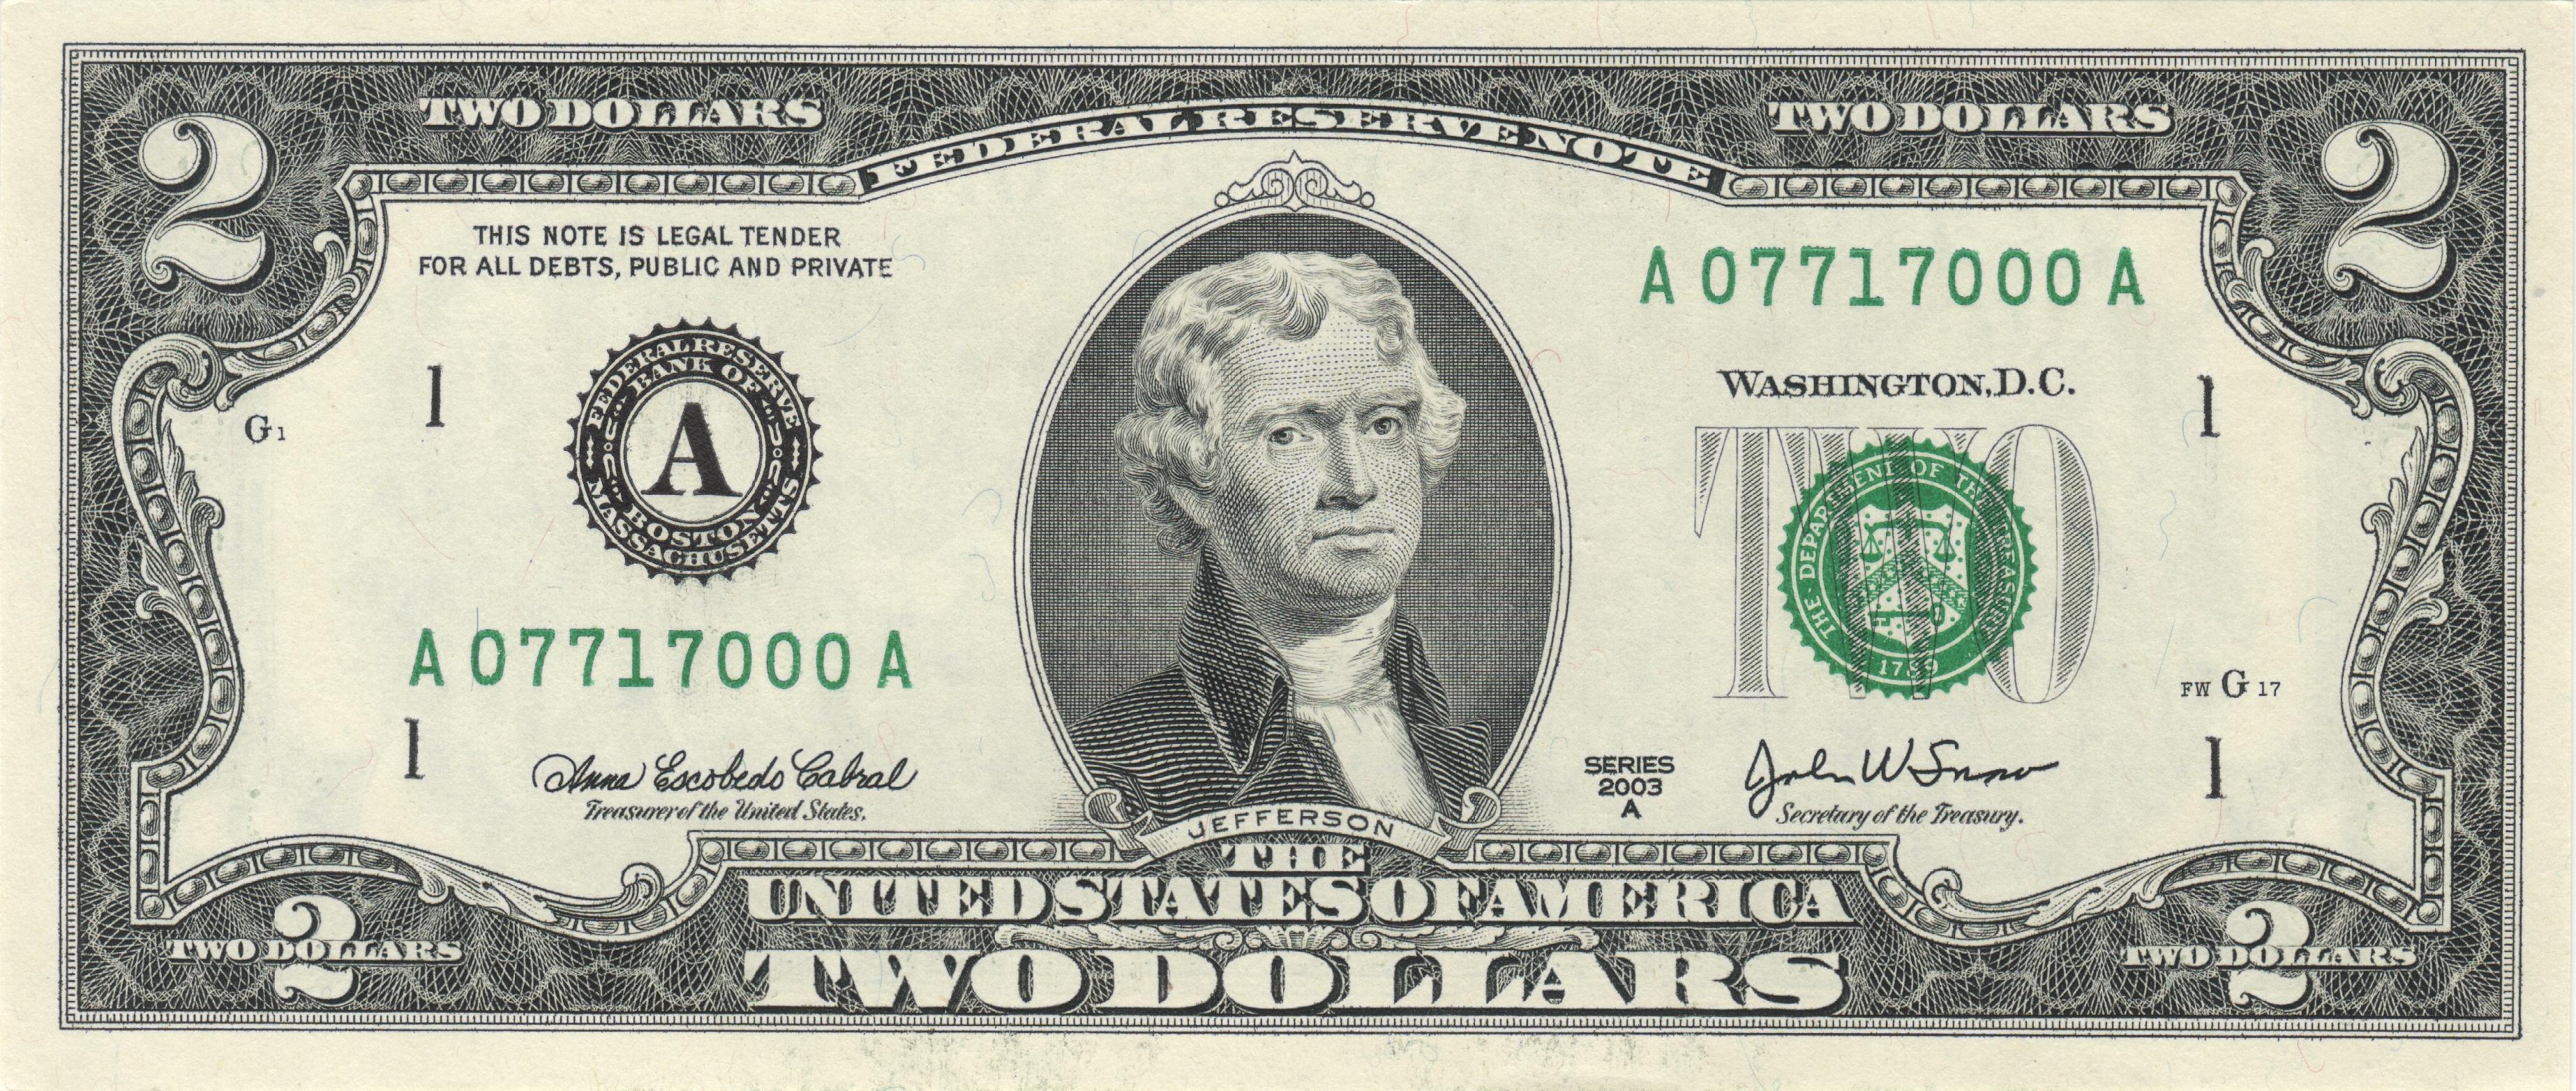 United States twodollar bill  Wikiwand